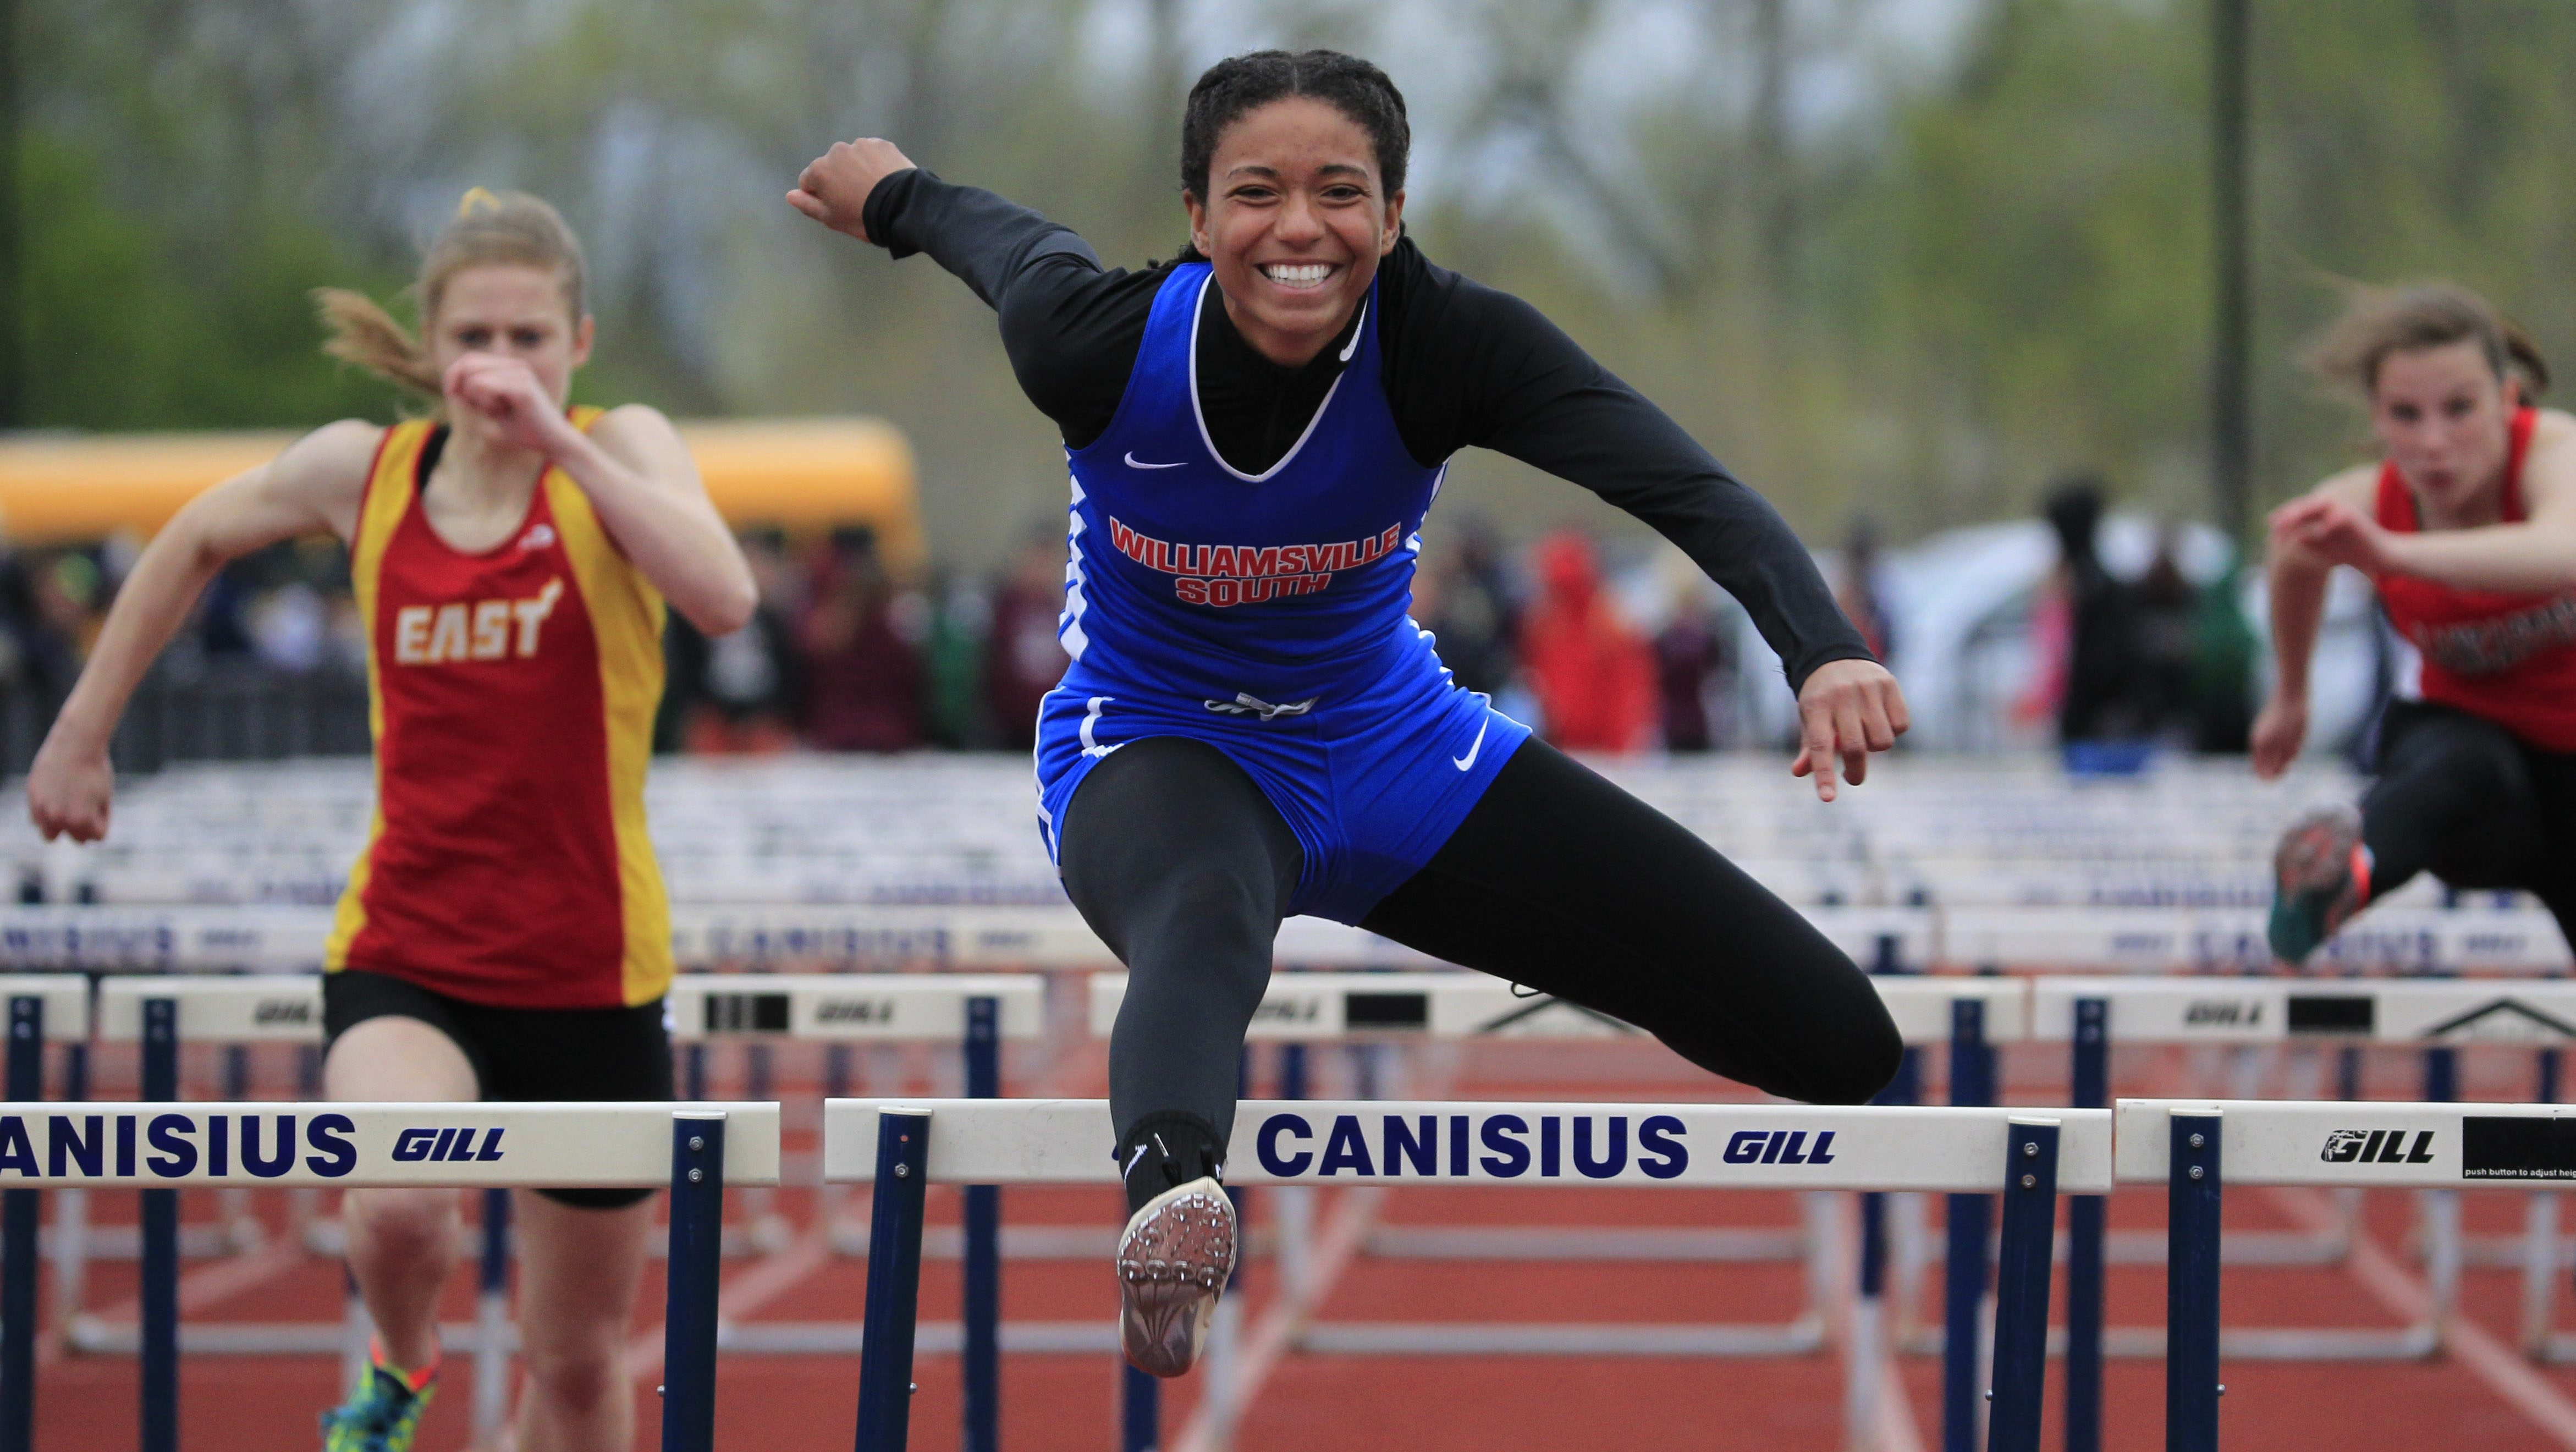 Alyssa Oviasogie of Williamsville South won the 100 meter hurdles in 15.33.